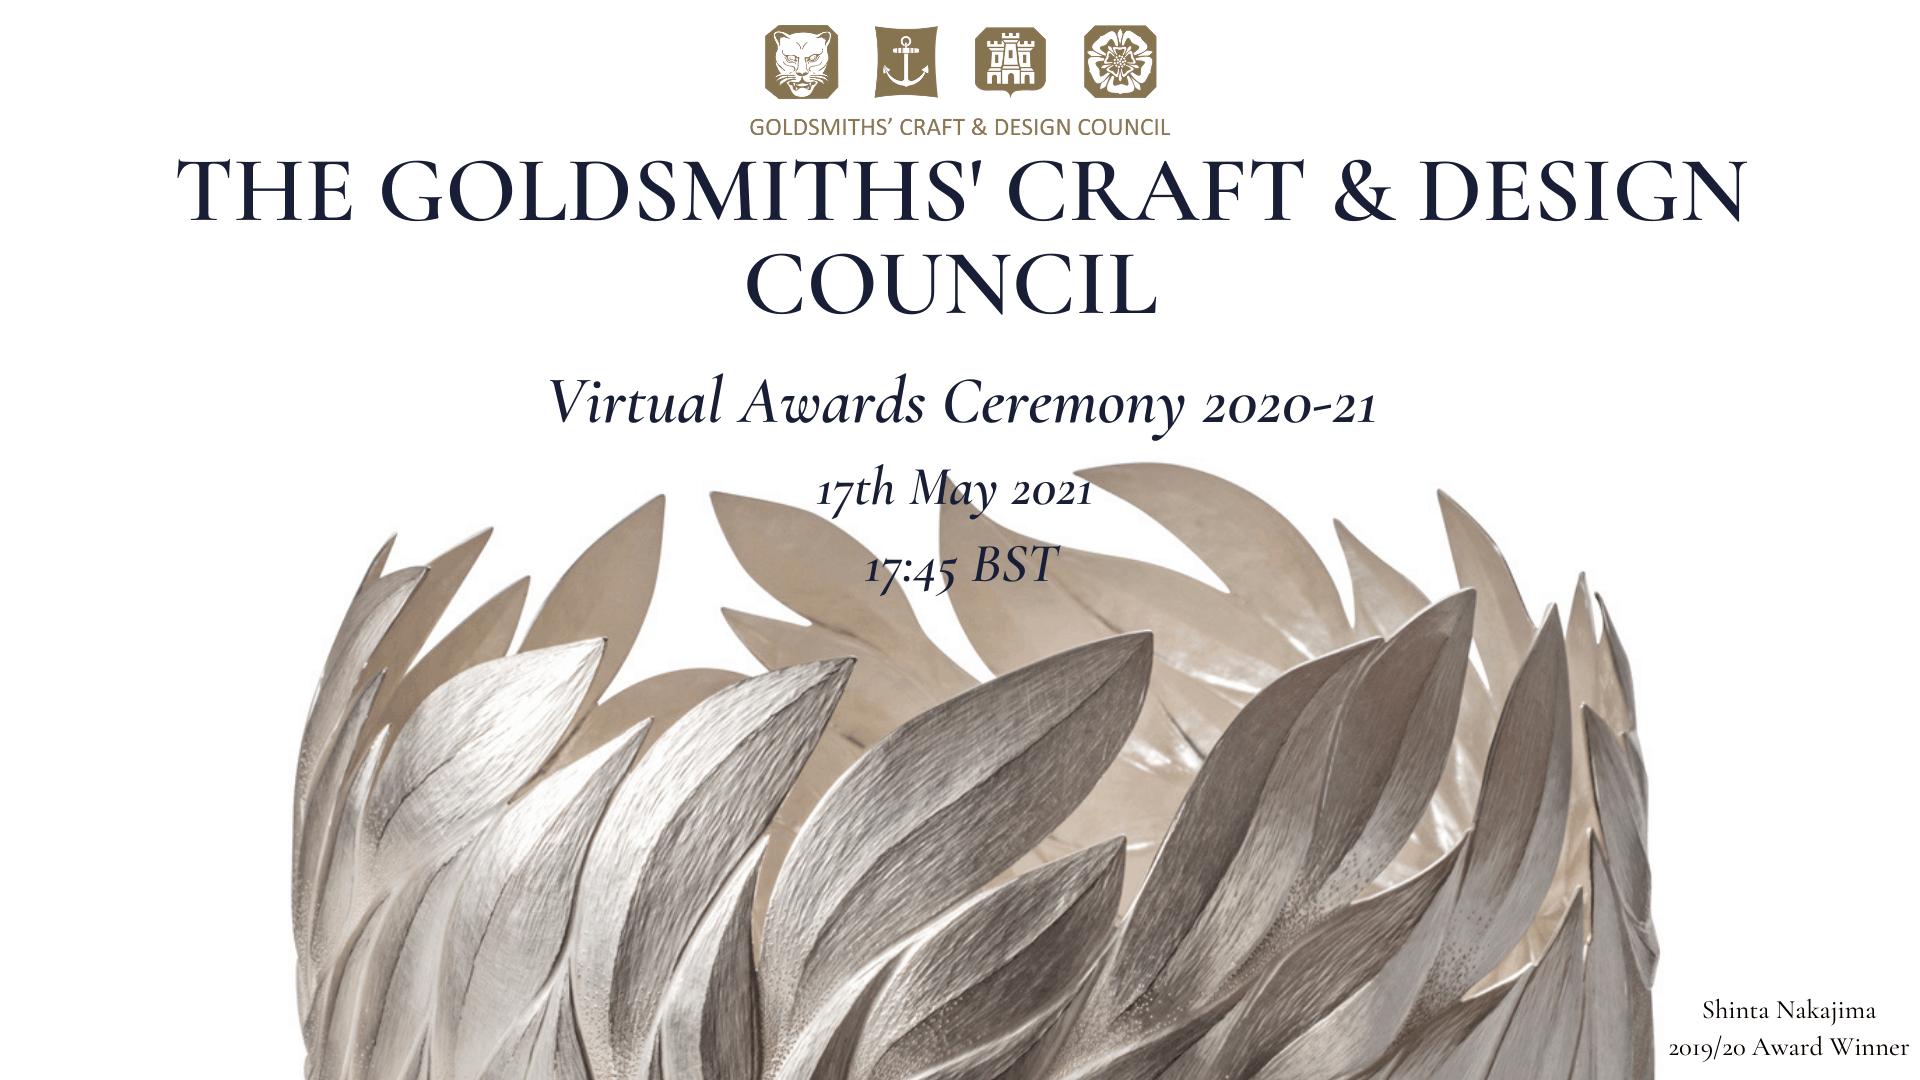 Craftsmanship & Design Awards ceremony